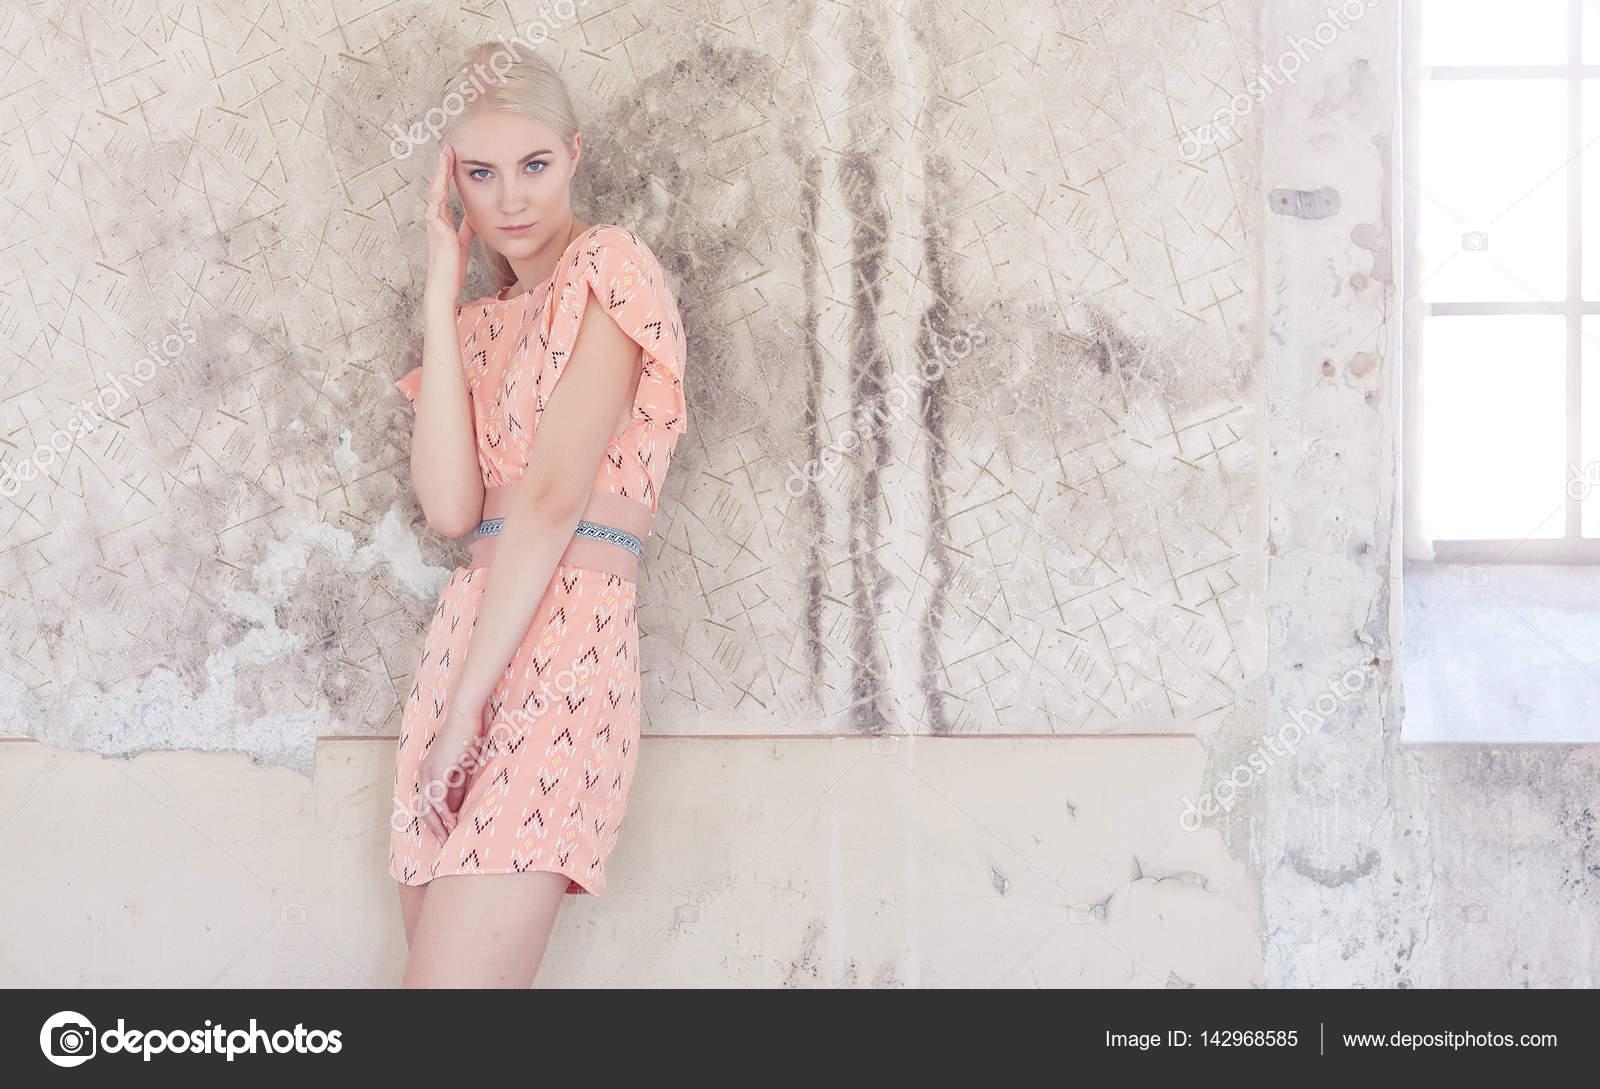 Licht Roze Jurk : Blonde vrouw in een licht roze jurk u2014 stockfoto © fxquadro #142968585